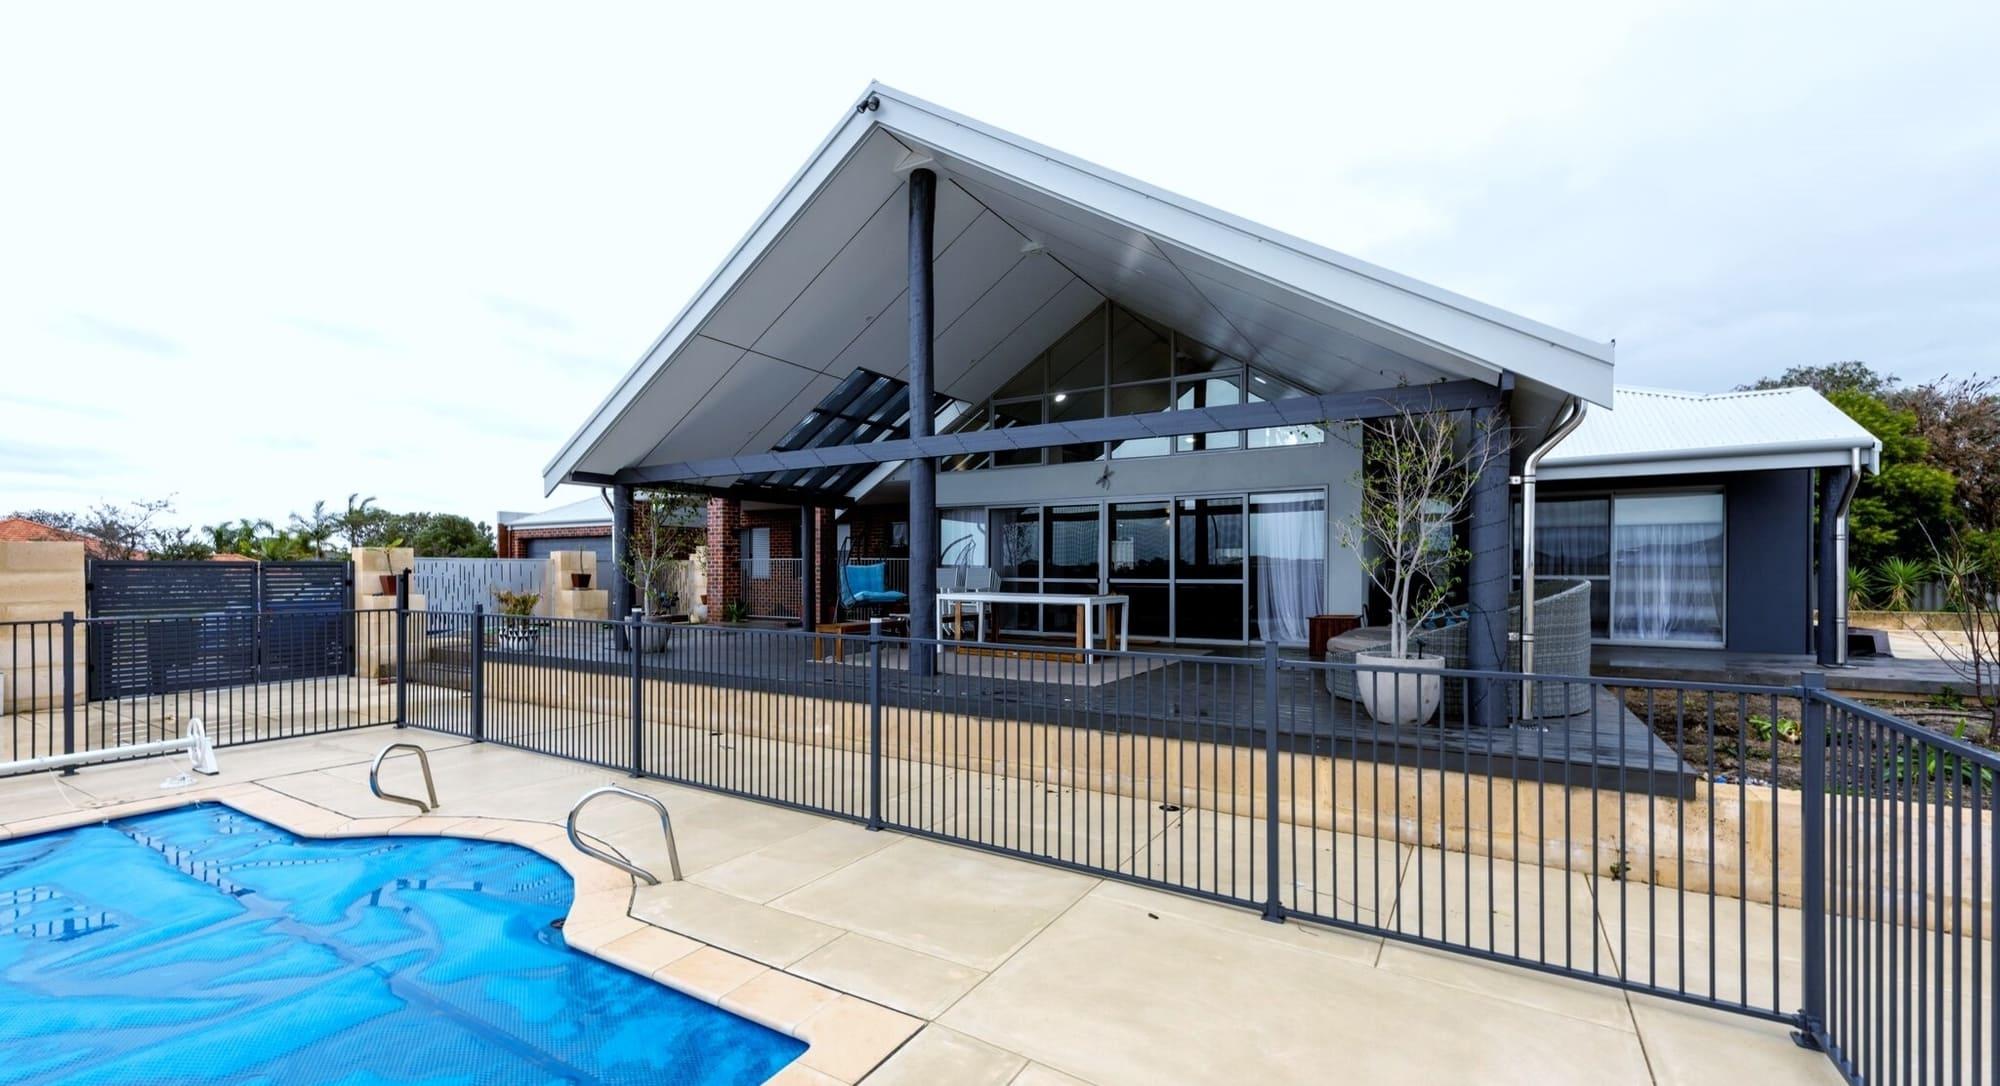 Alfresco Area in a New Home Australind built by Bunbury Builders - Coastline Homes